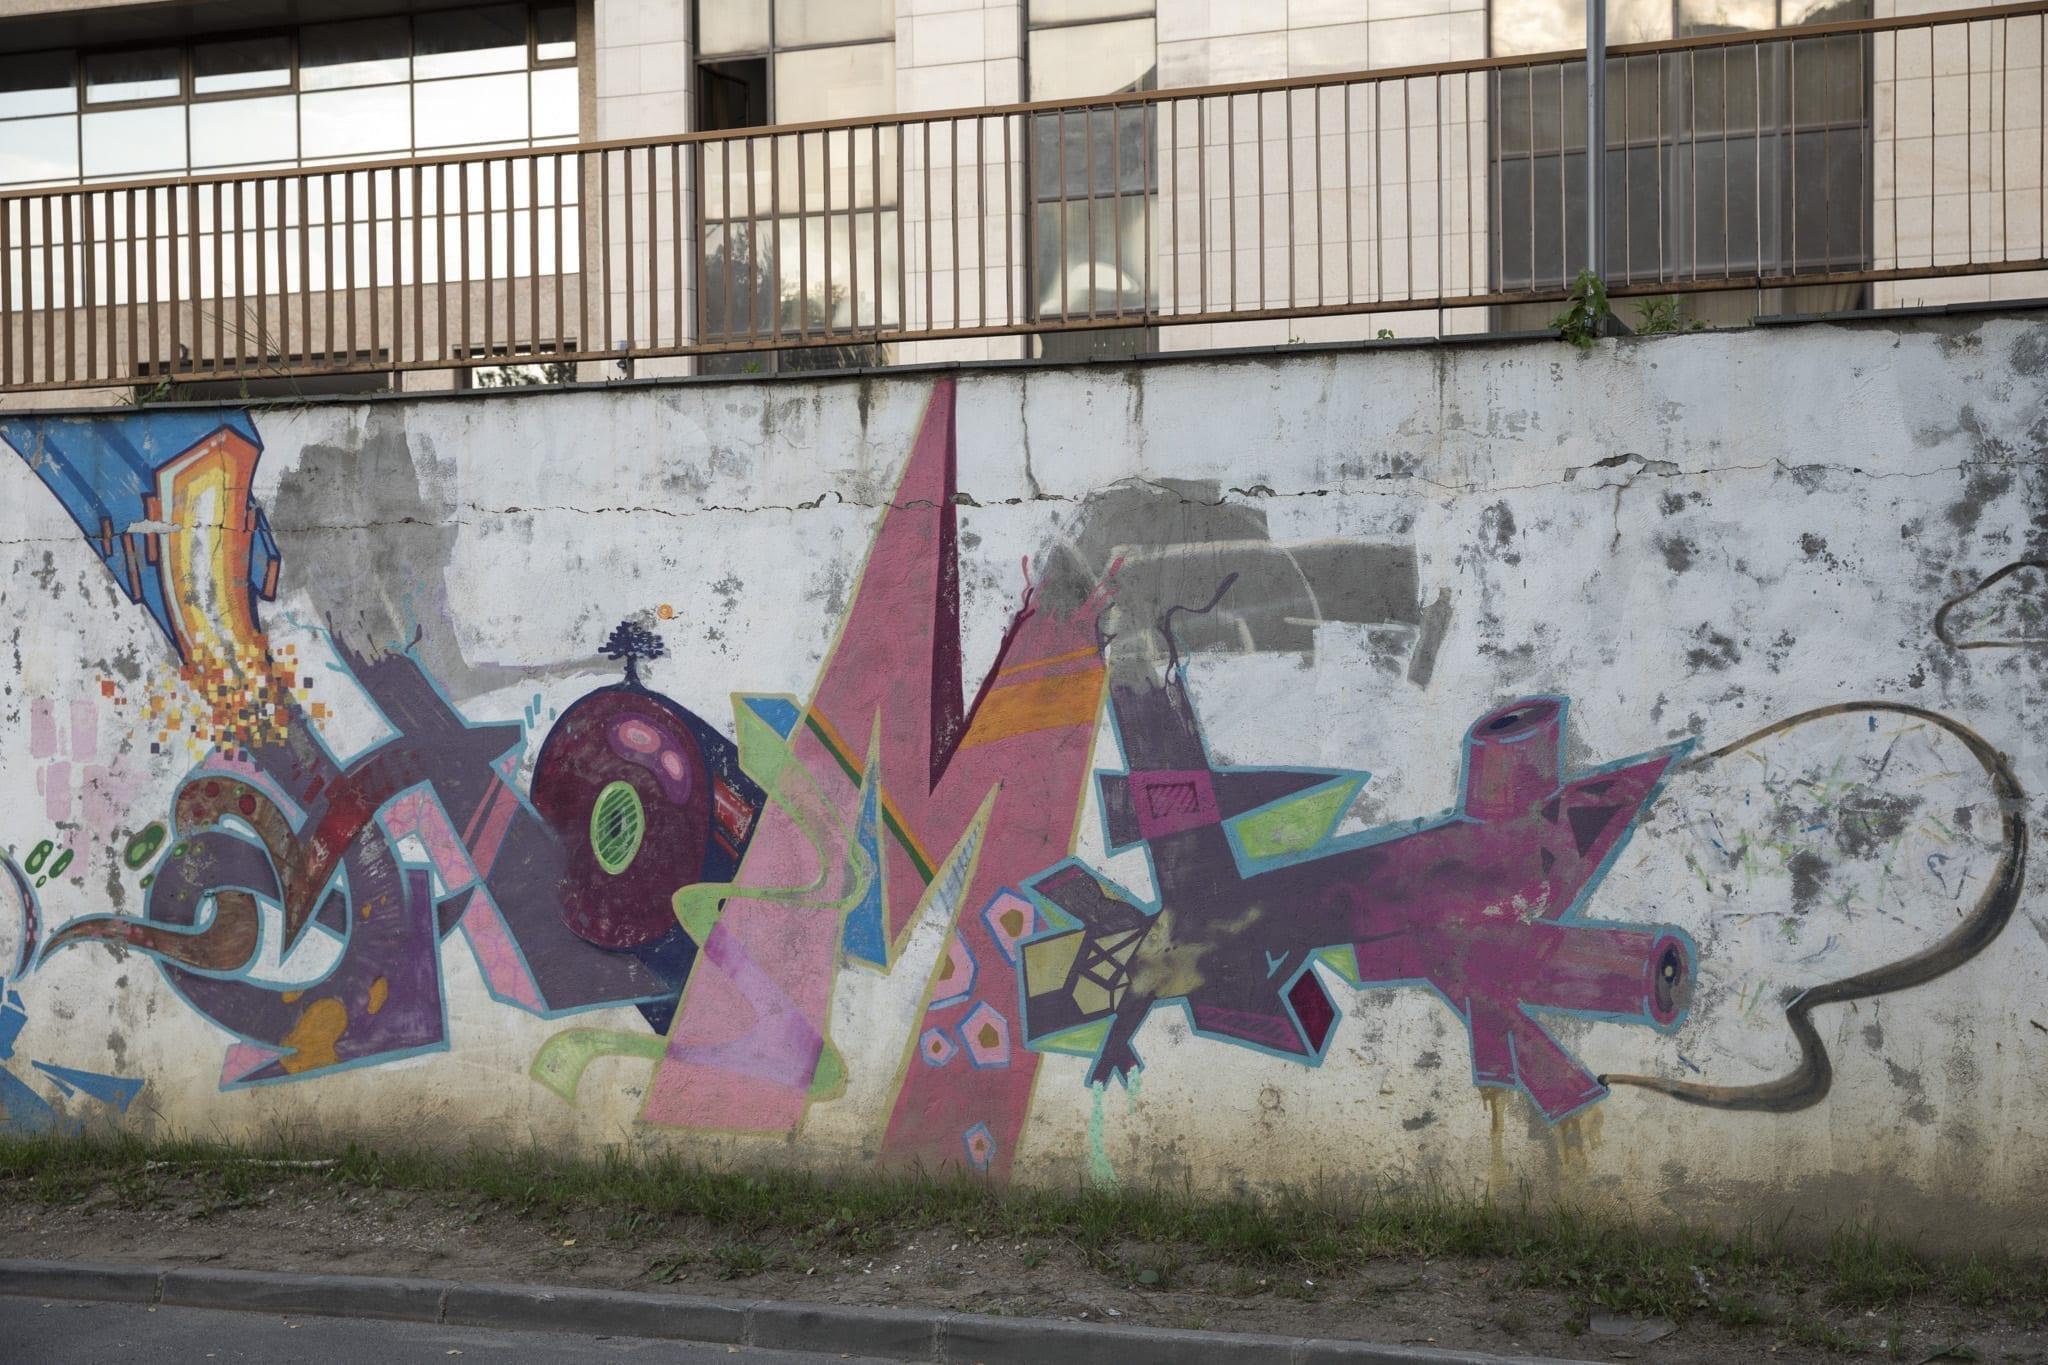 HOMEBOY LDJ Strada Gheorghe Șincai Brasov Un-hidden street art in Romania